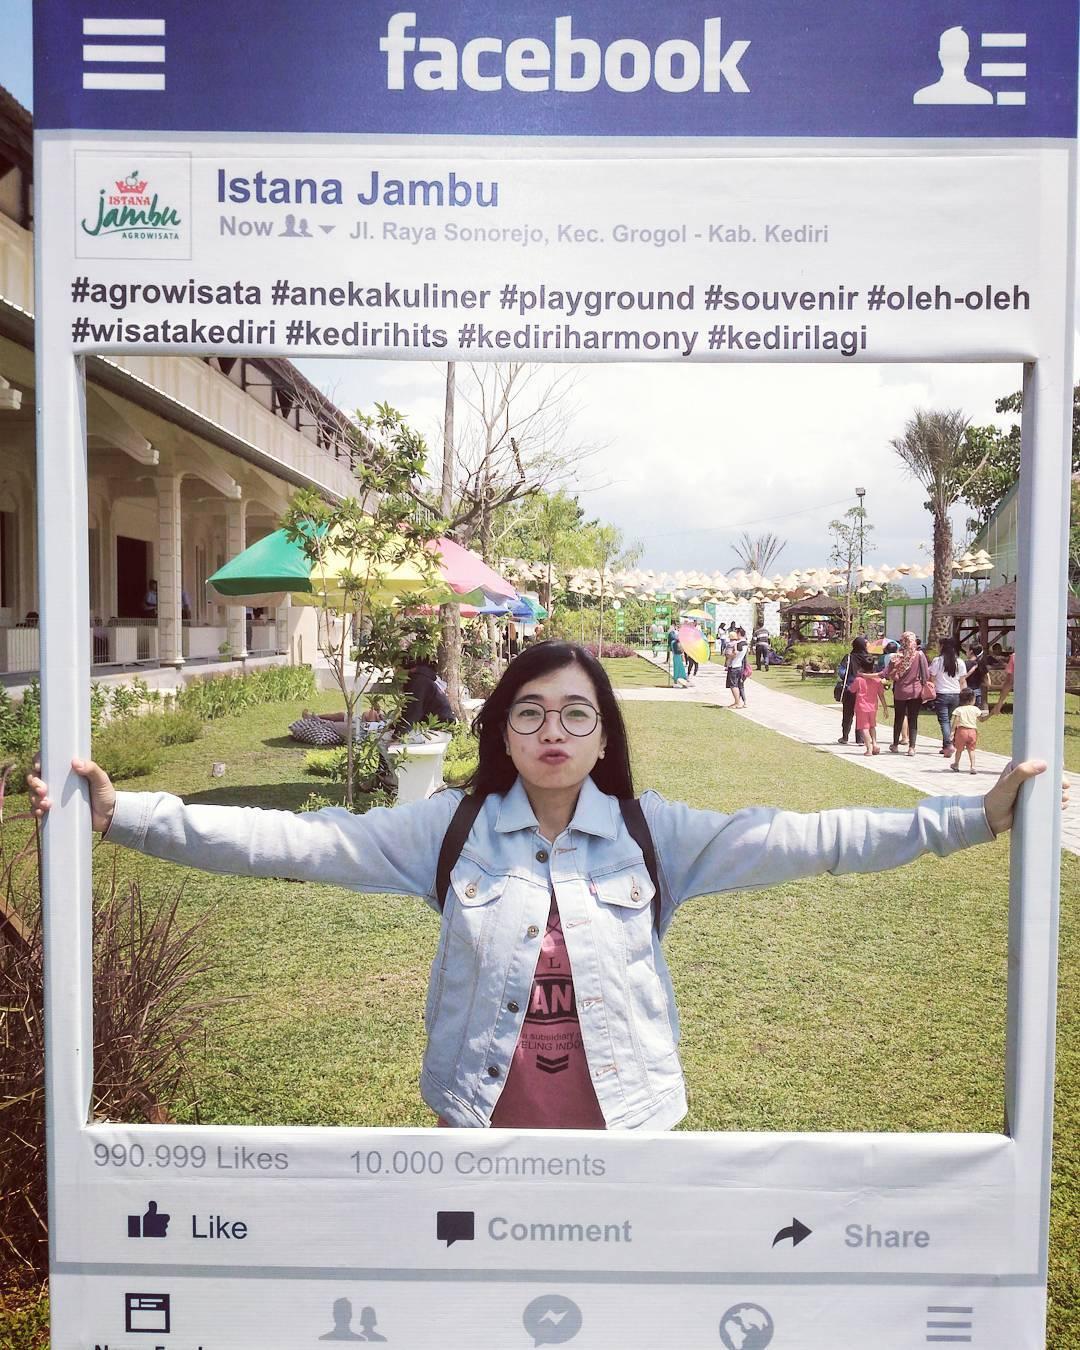 Wisata Istana Jambu Kediri Menjadi Tempat Foto Oleh Ig Meikatama